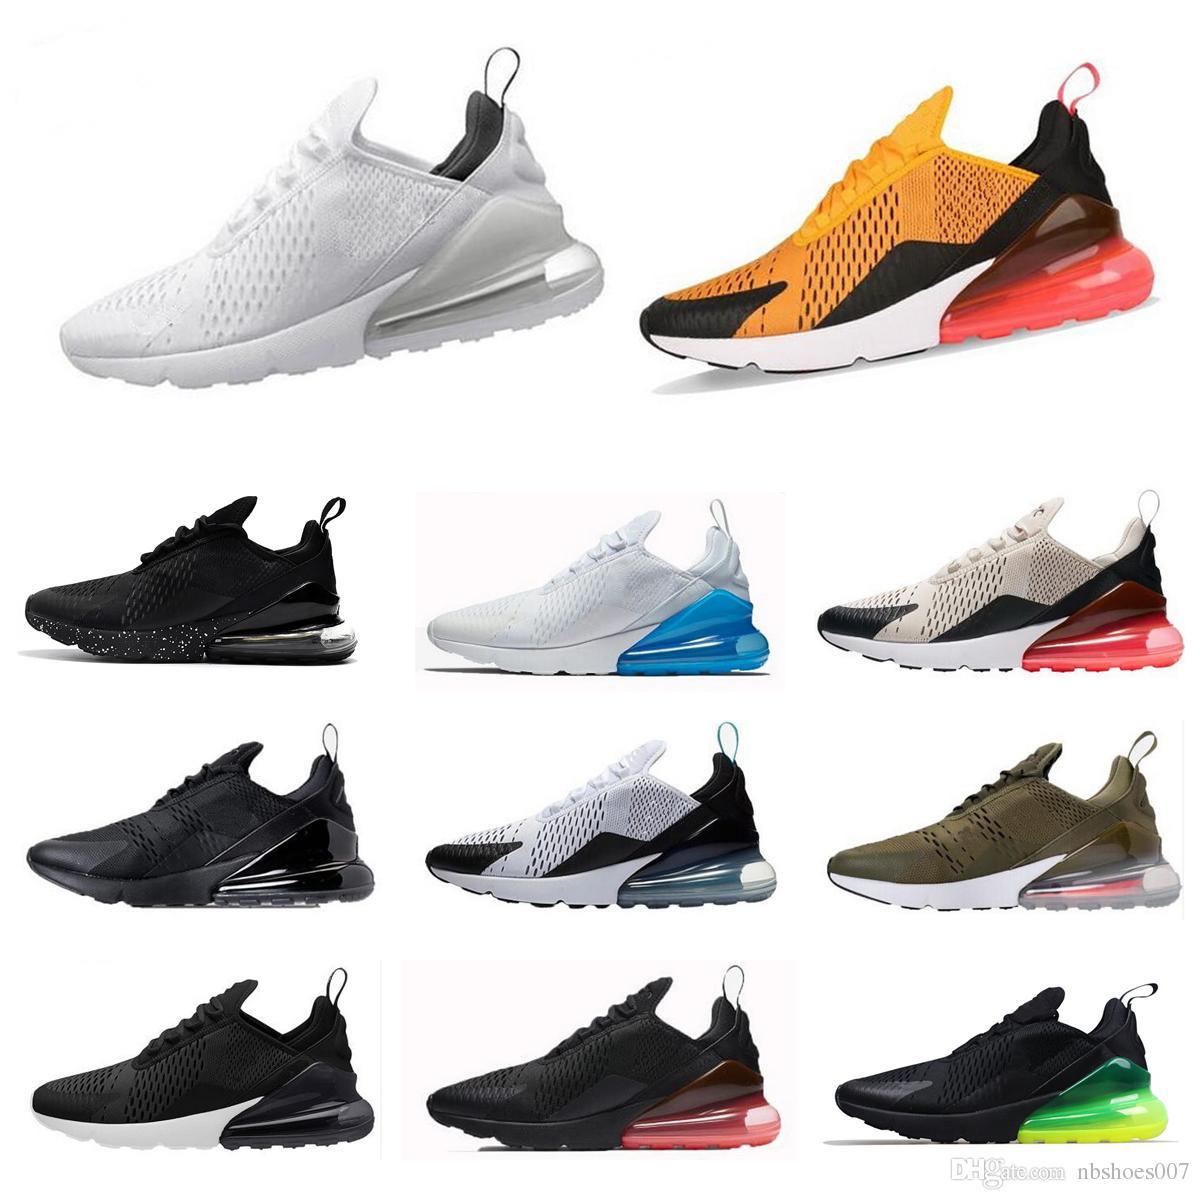 promo code aa5c7 27401 Cheap Baby Shoe Sneaker Best Shoes Sneakers X